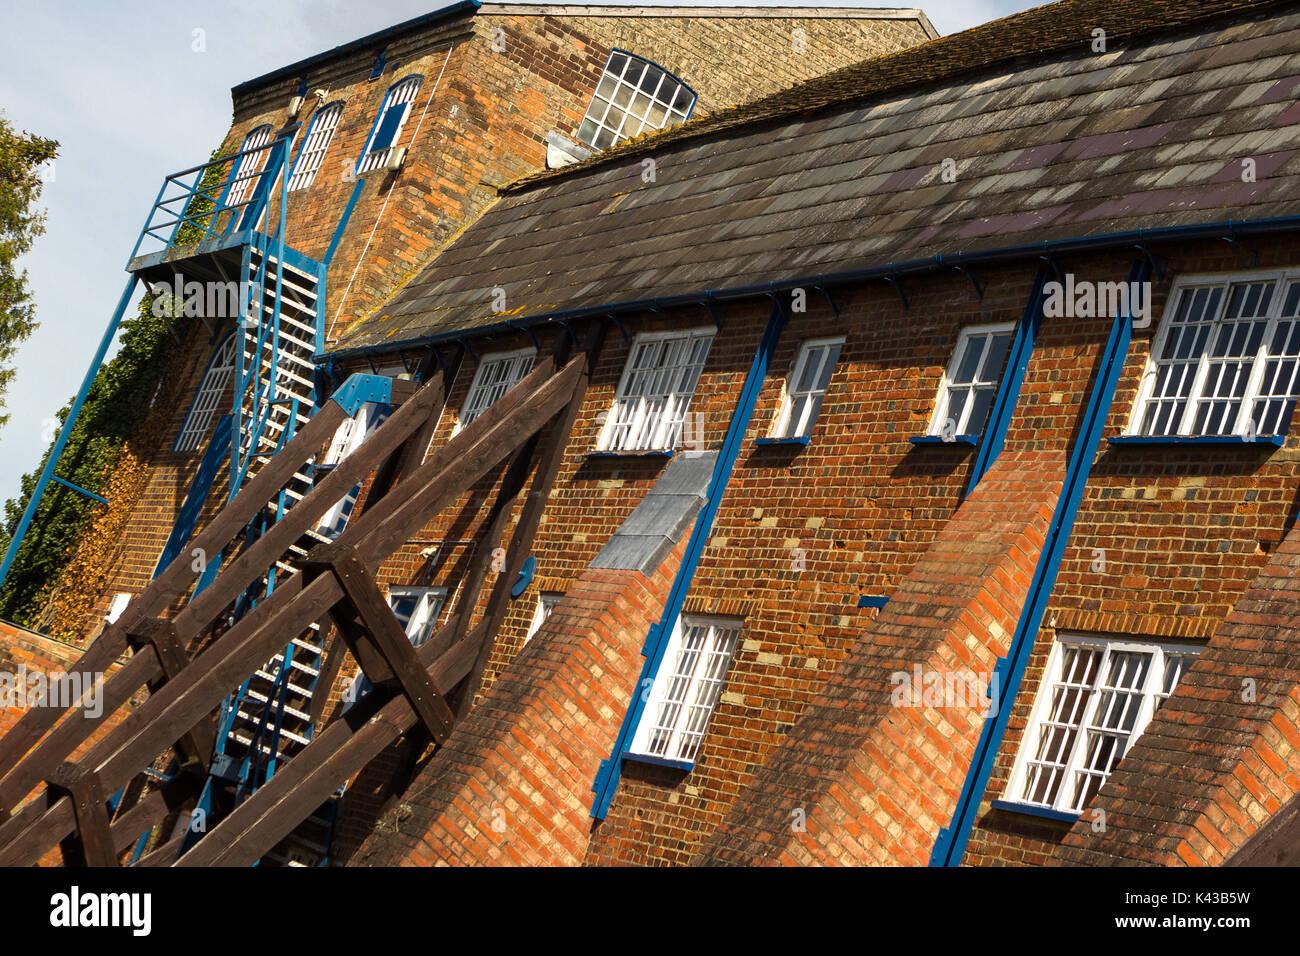 Wooden support joists. Wilton England UK - Stock Image